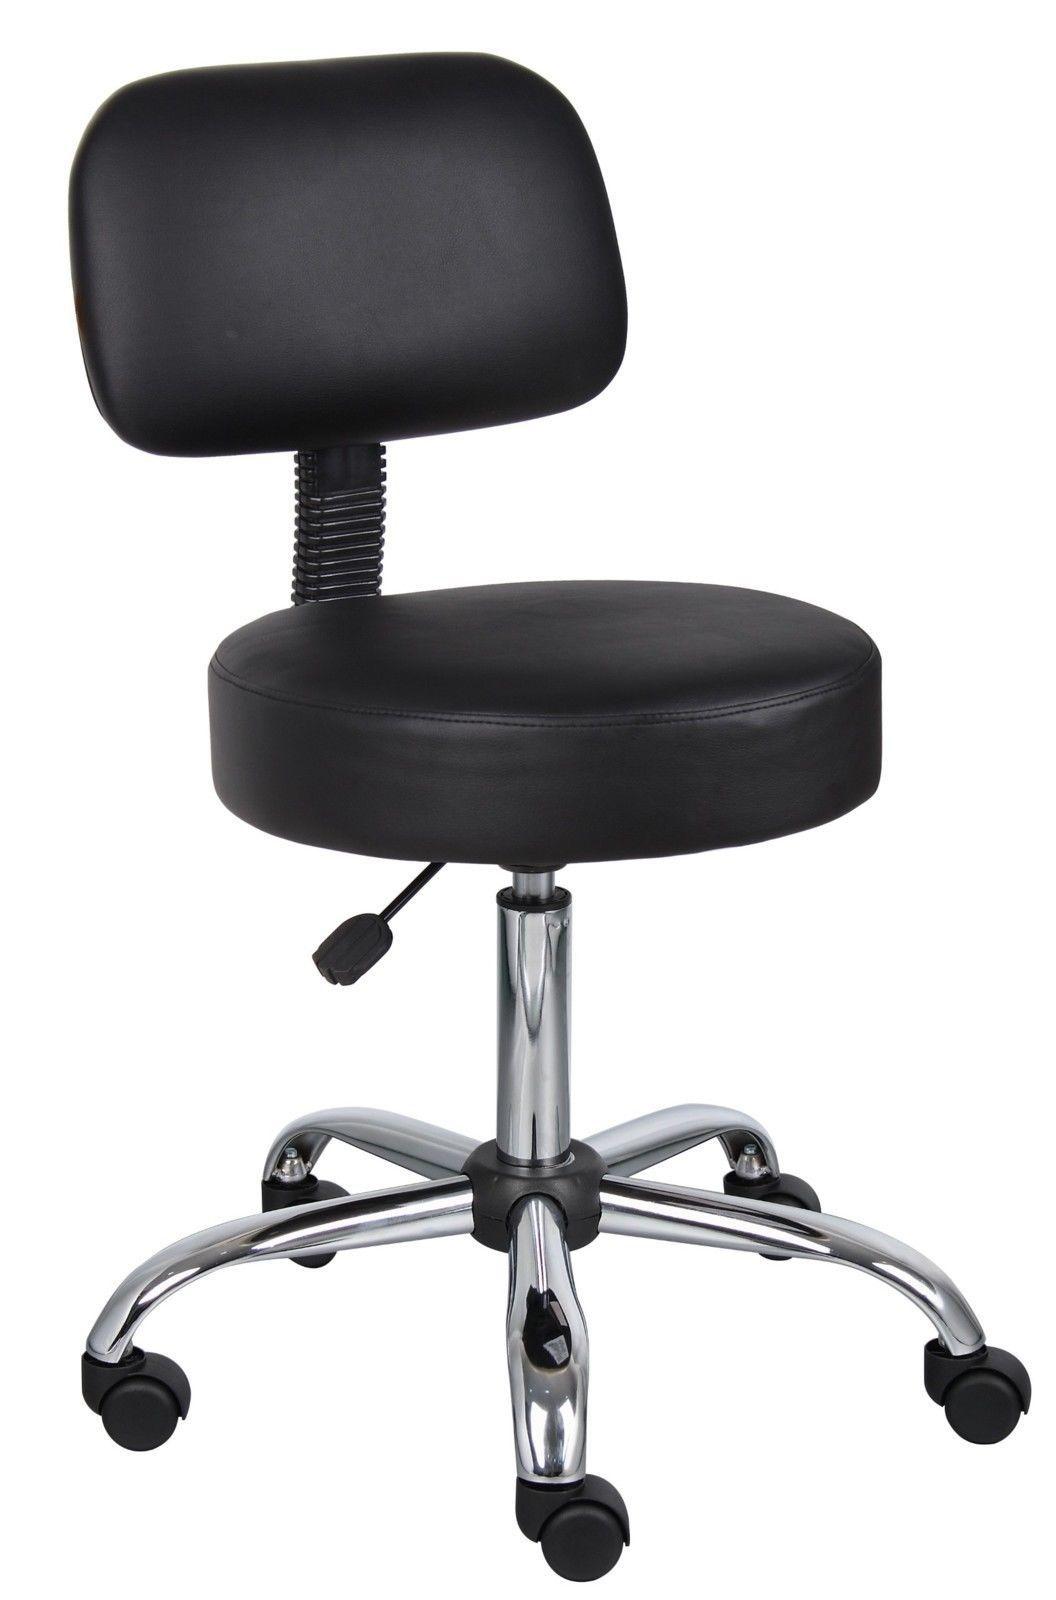 work shop stool chair bench mechanics adjustable seat swivel garage rh pinterest com